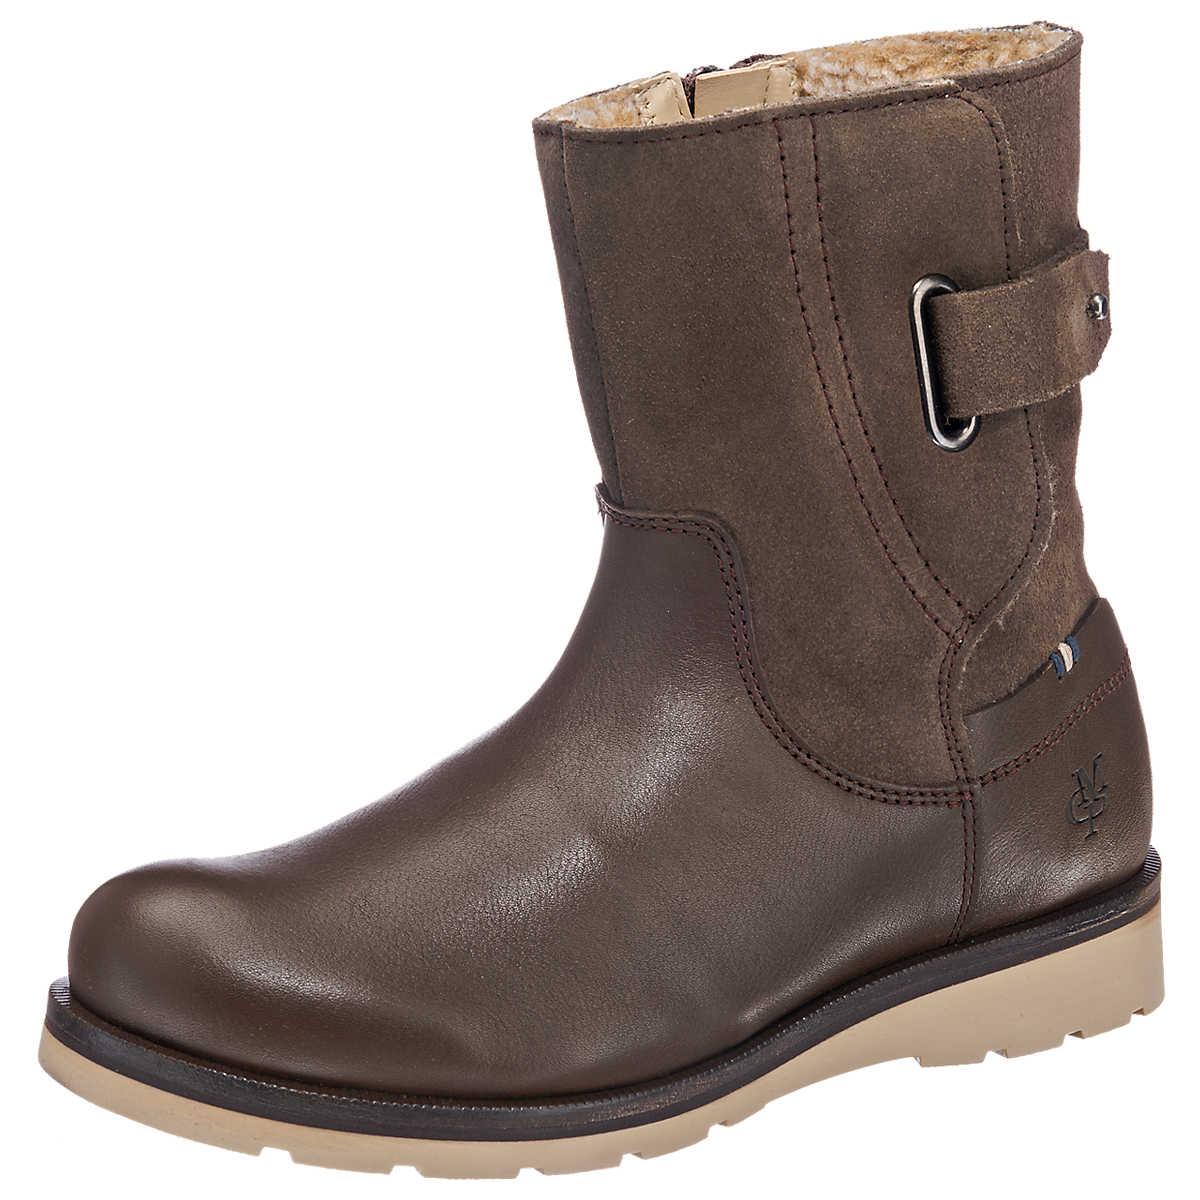 MARC O�´POLO Stiefel taupe - Marc O�´Polo - Stiefel - Schuhe - mirapodo.de